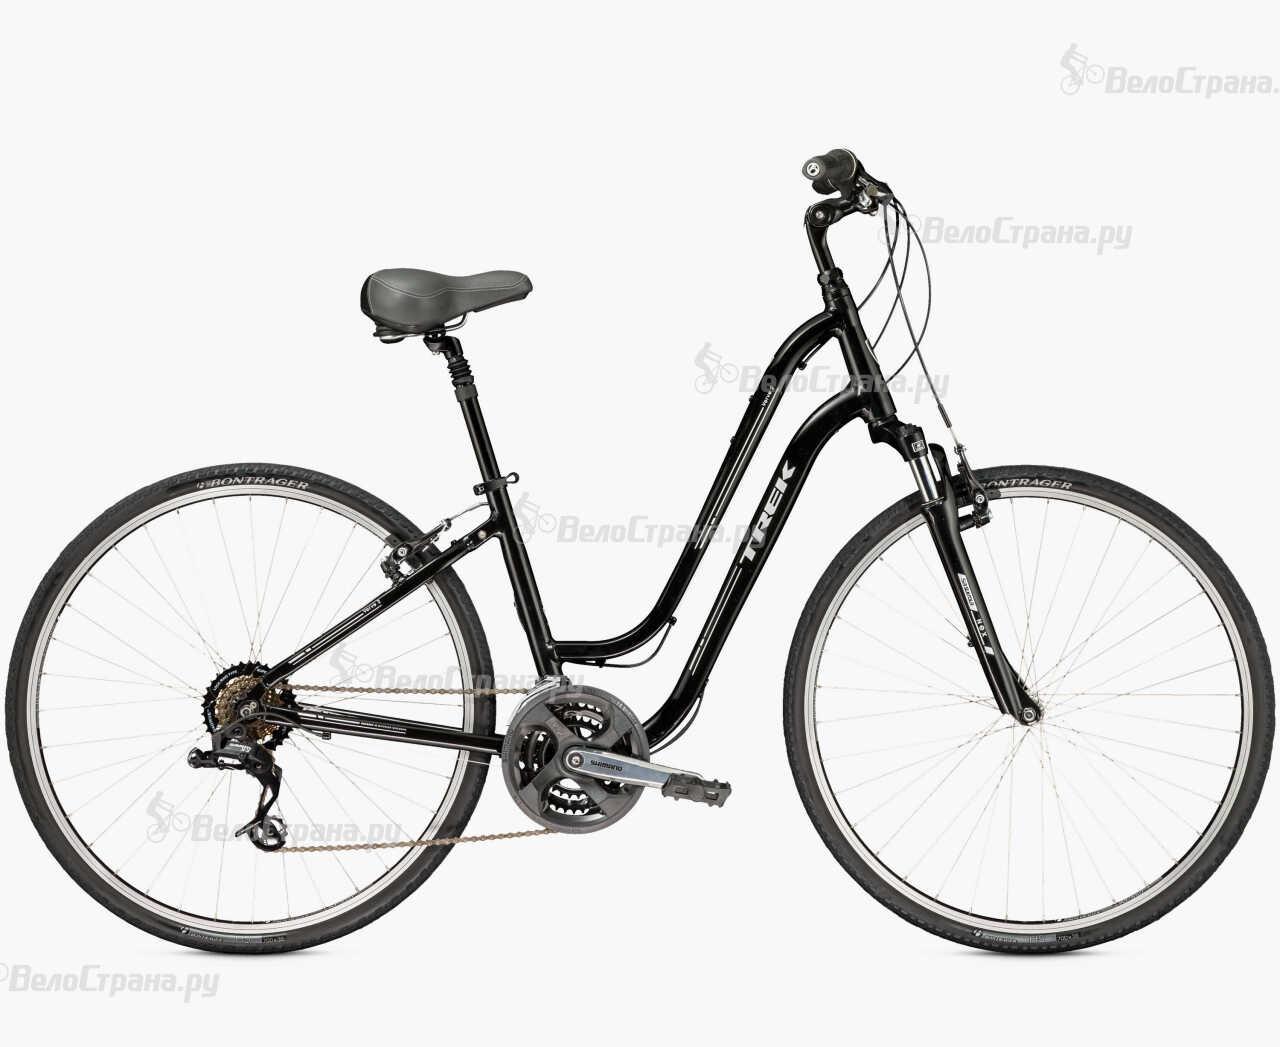 Велосипед Trek Verve 2 WSD (2016) велосипед trek madone 3 1 wsd 2013